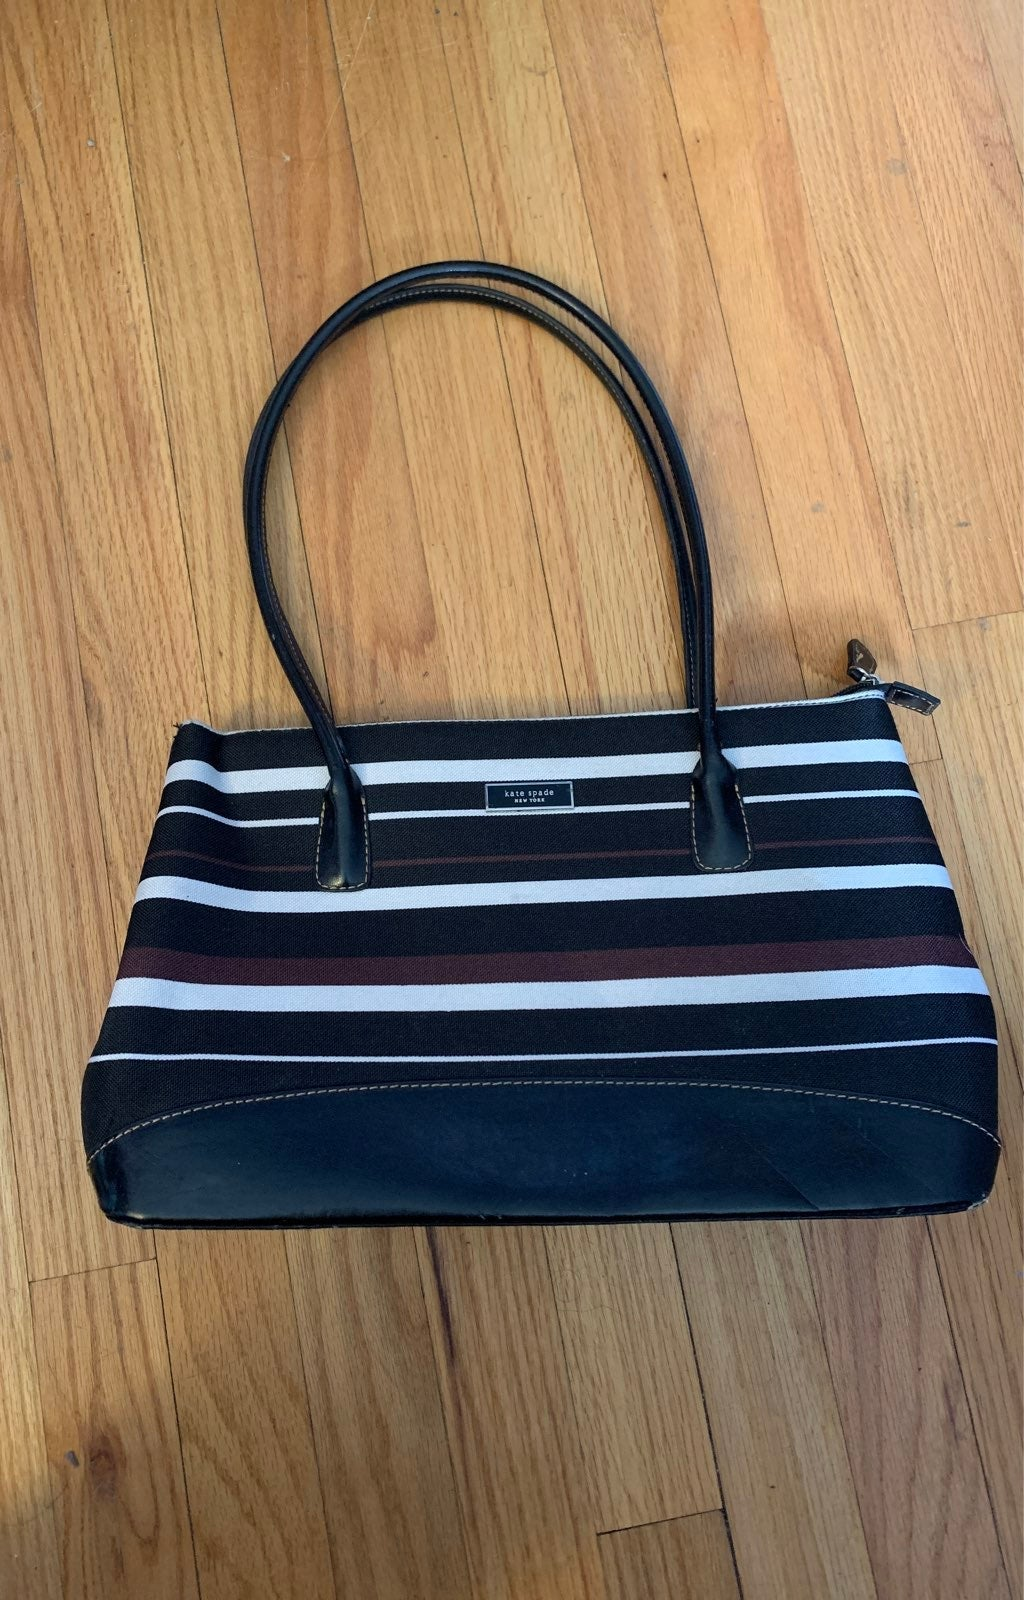 Kate Spade Small Shoulder Bag - Used